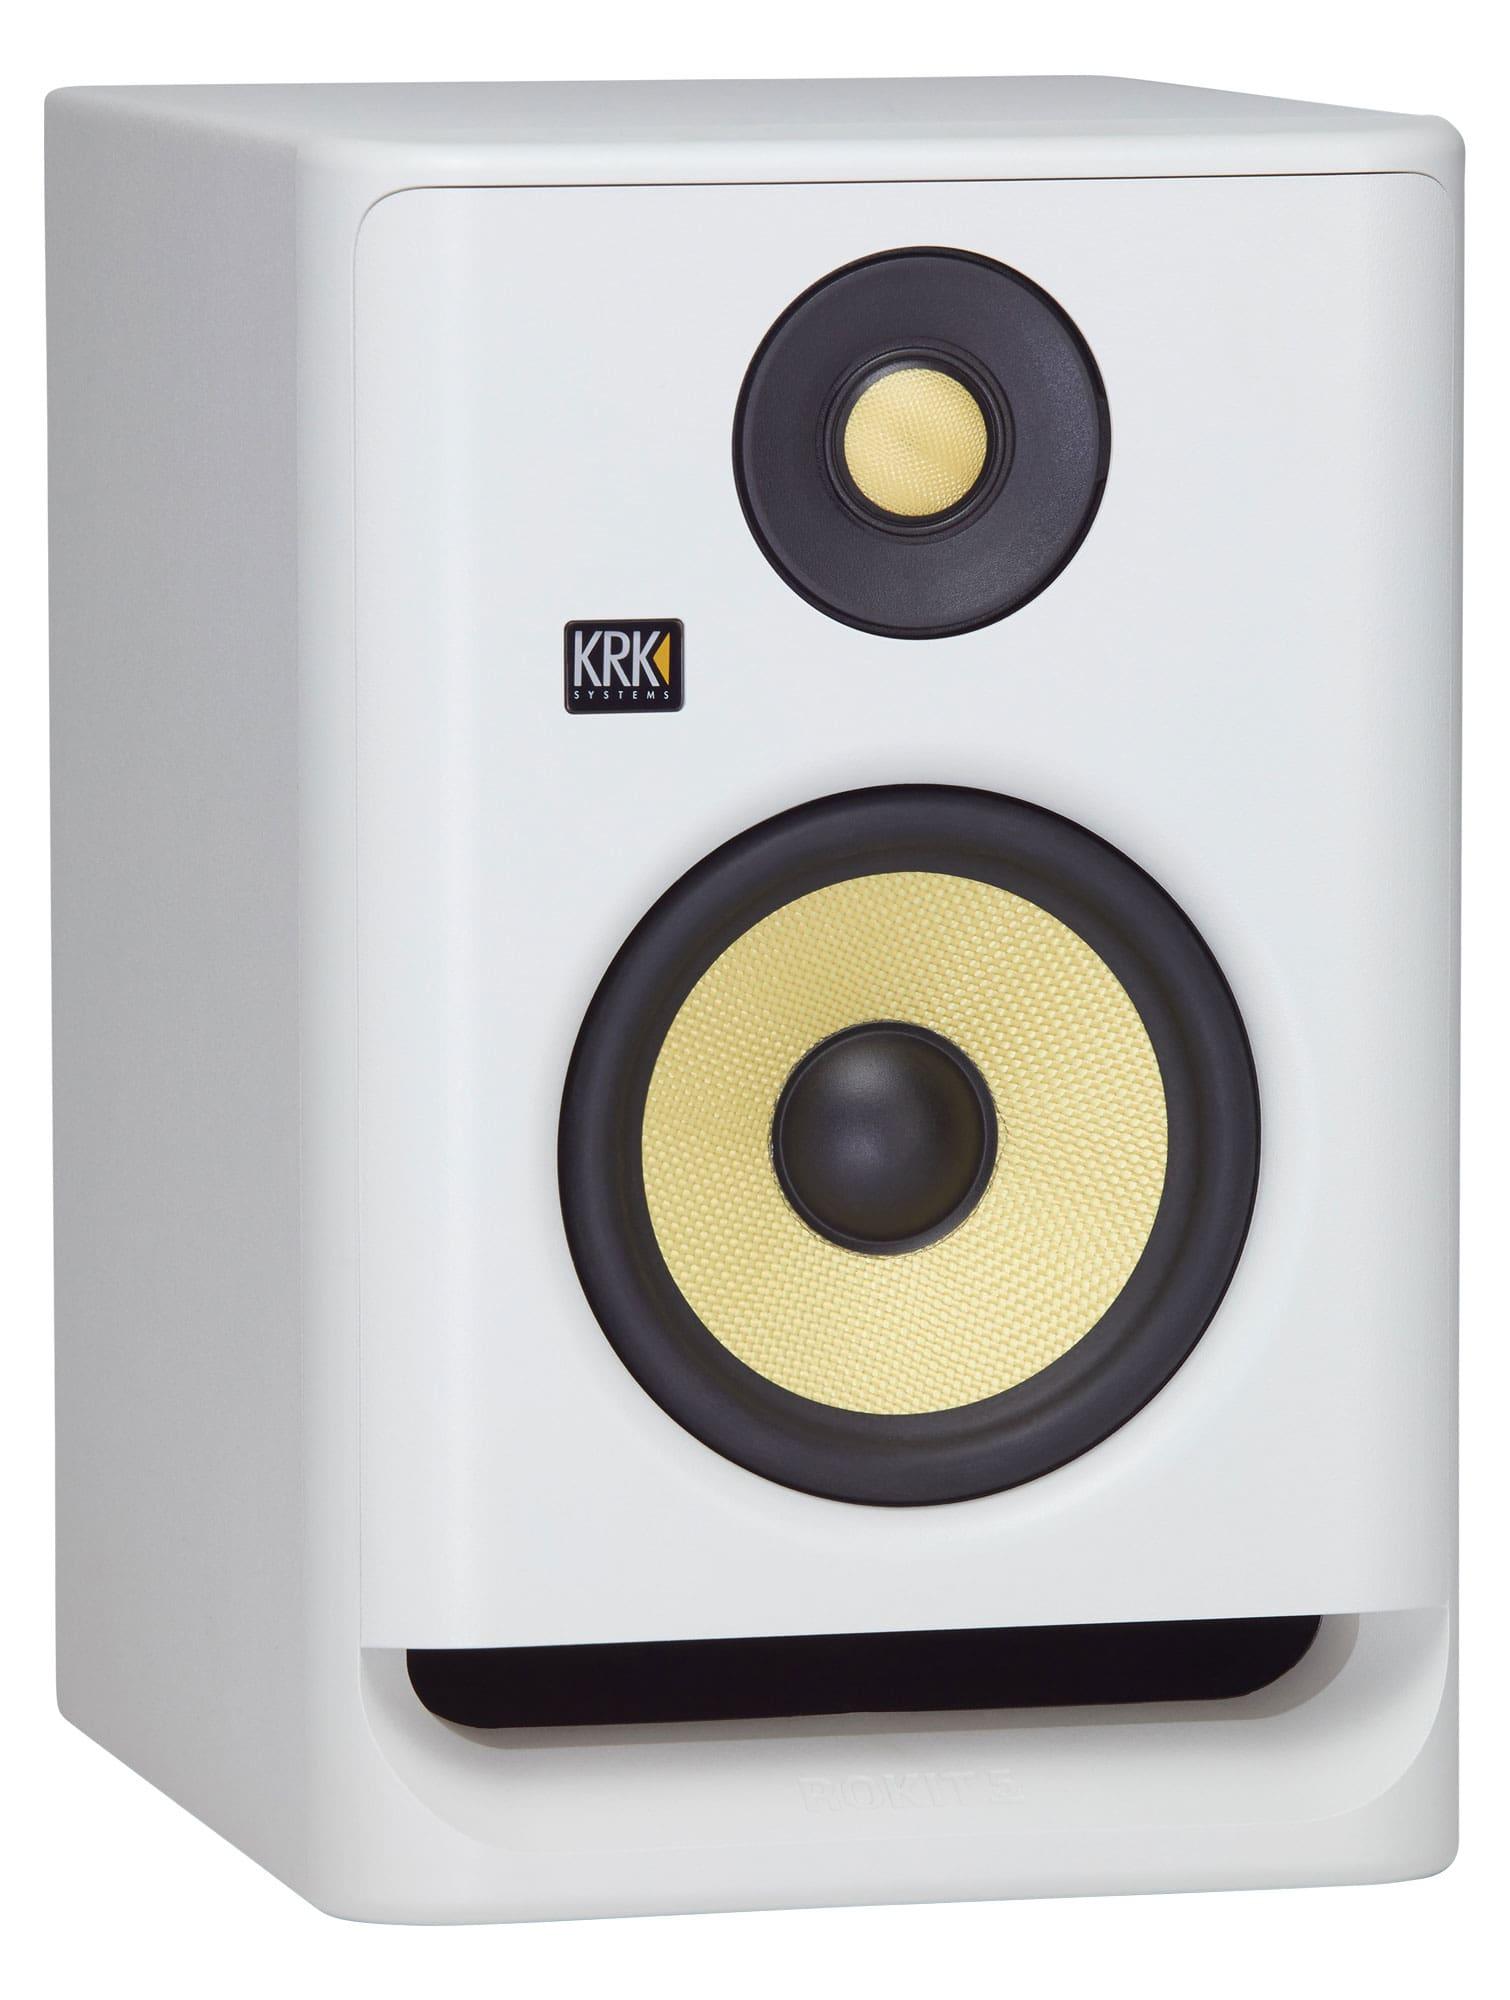 Studiomonitore - KRK ROKIT RP5 G4 White Noise - Onlineshop Musikhaus Kirstein